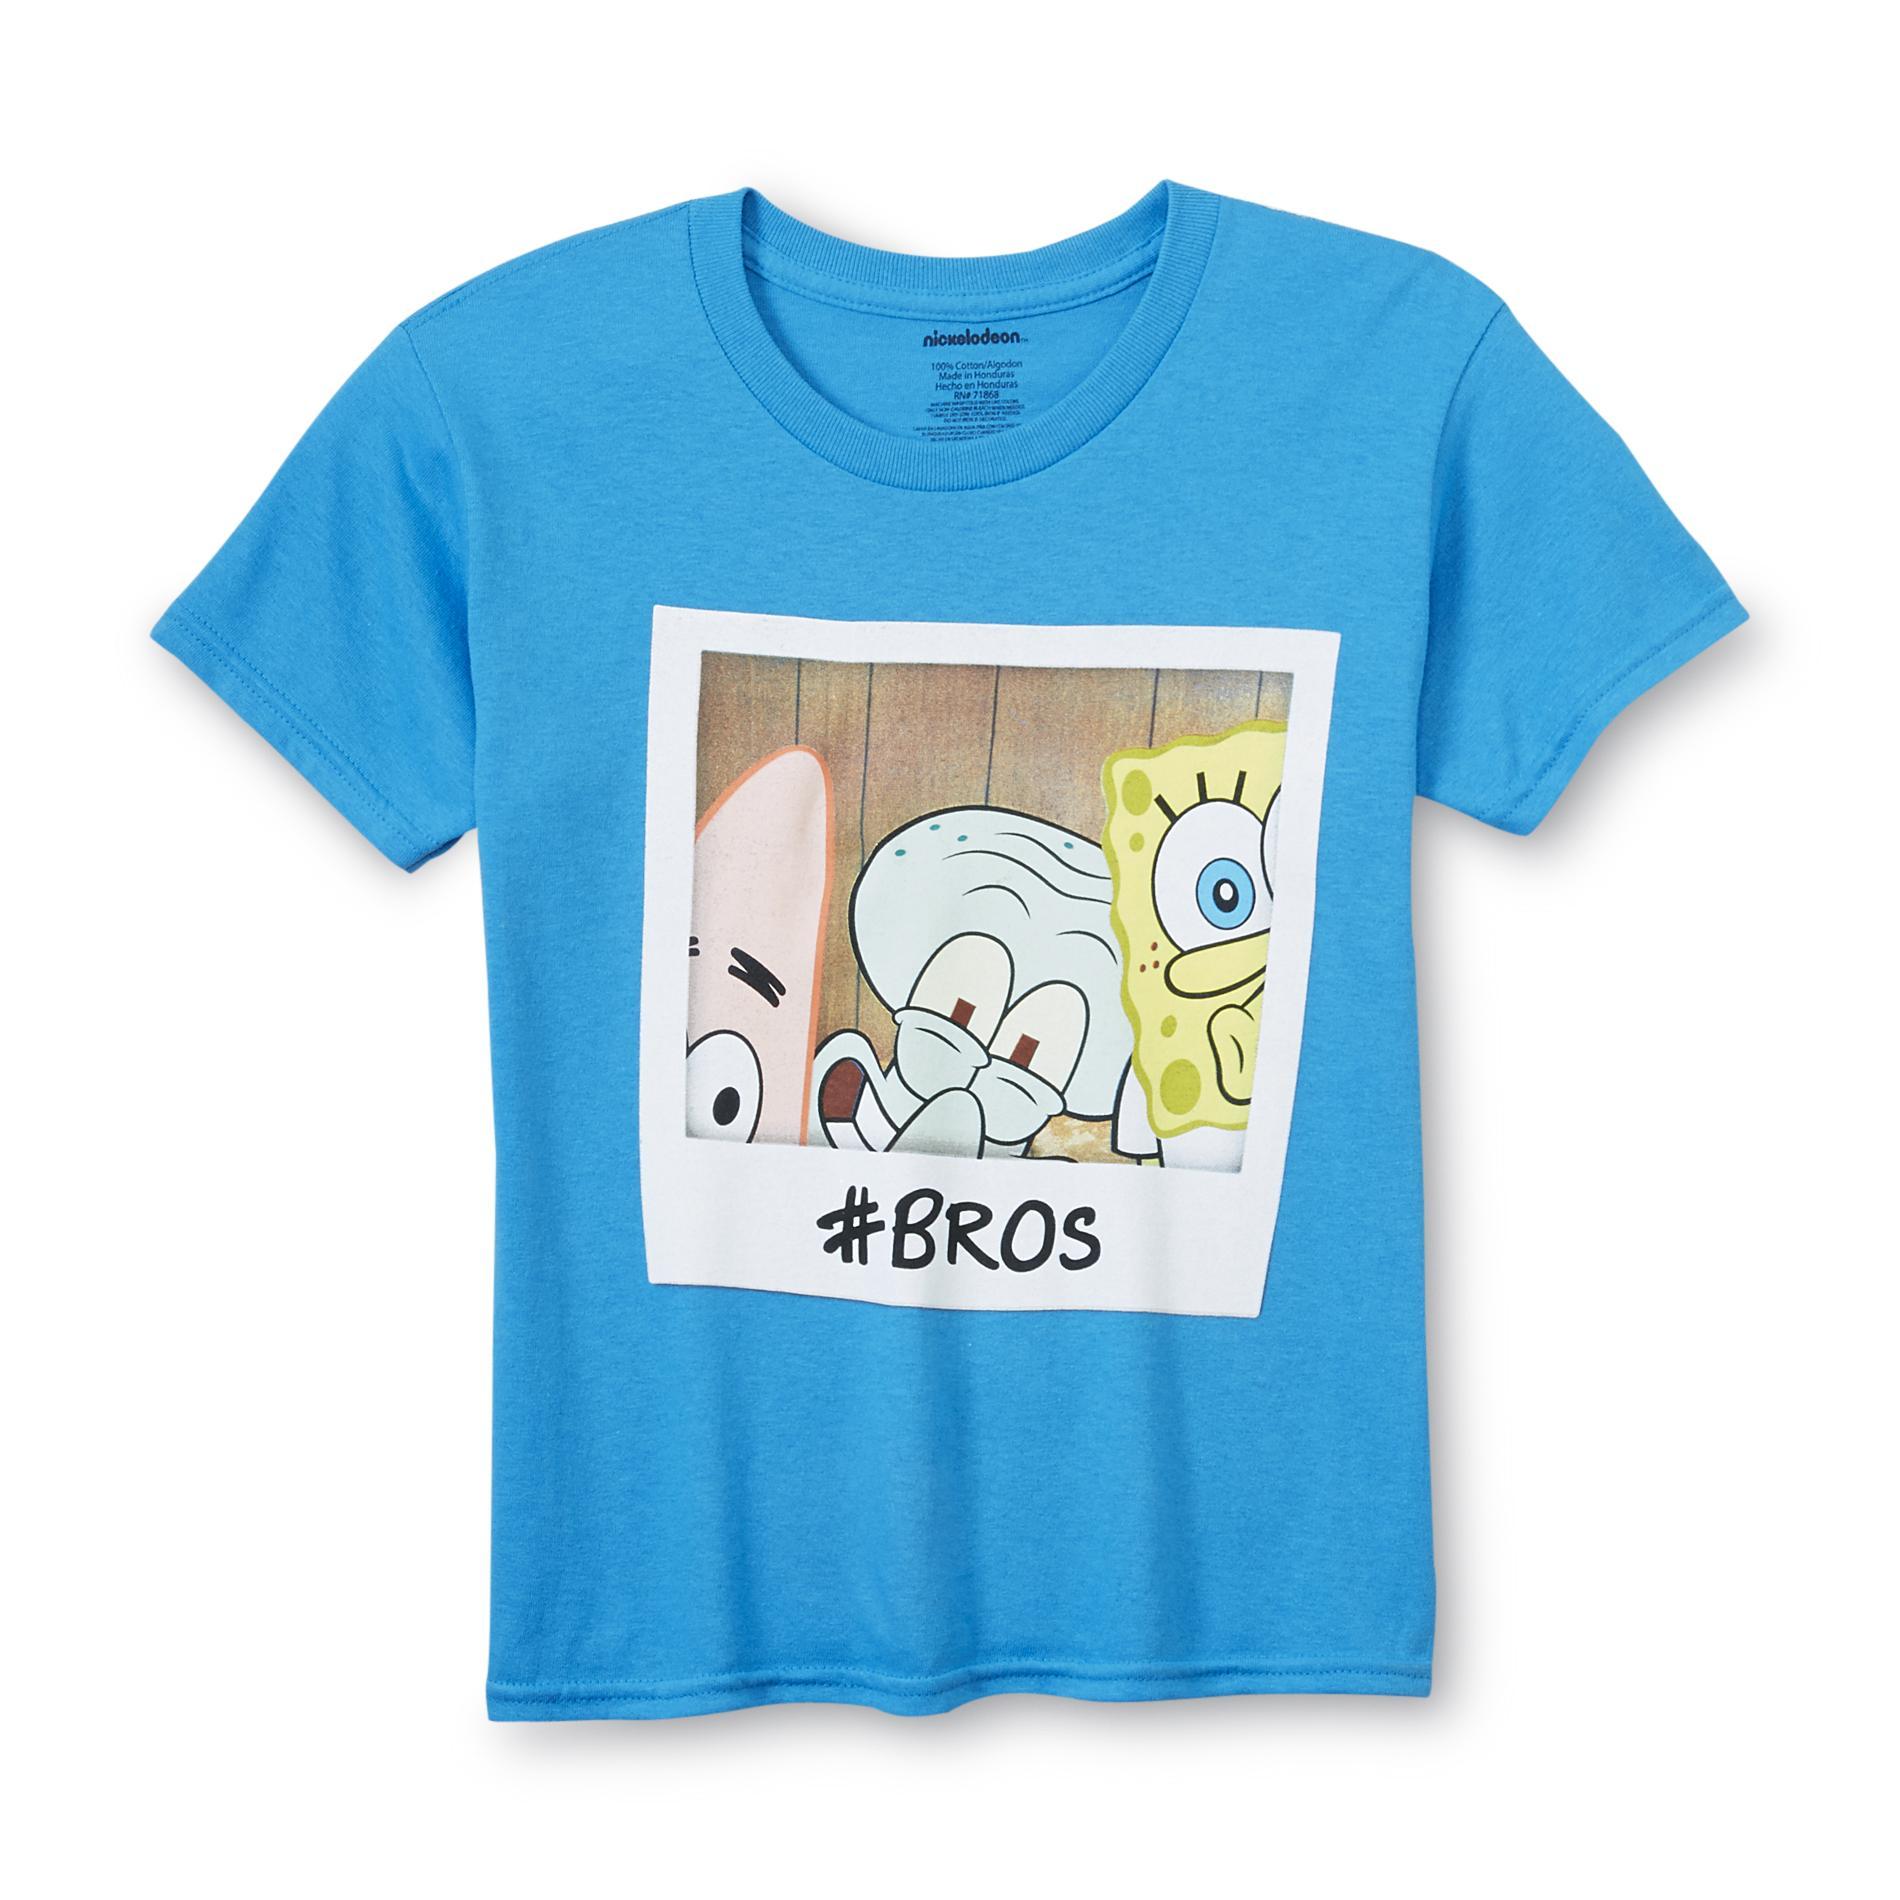 Nickelodeon SpongeBob SquarePants Boy's Graphic T-Shirt - Bros